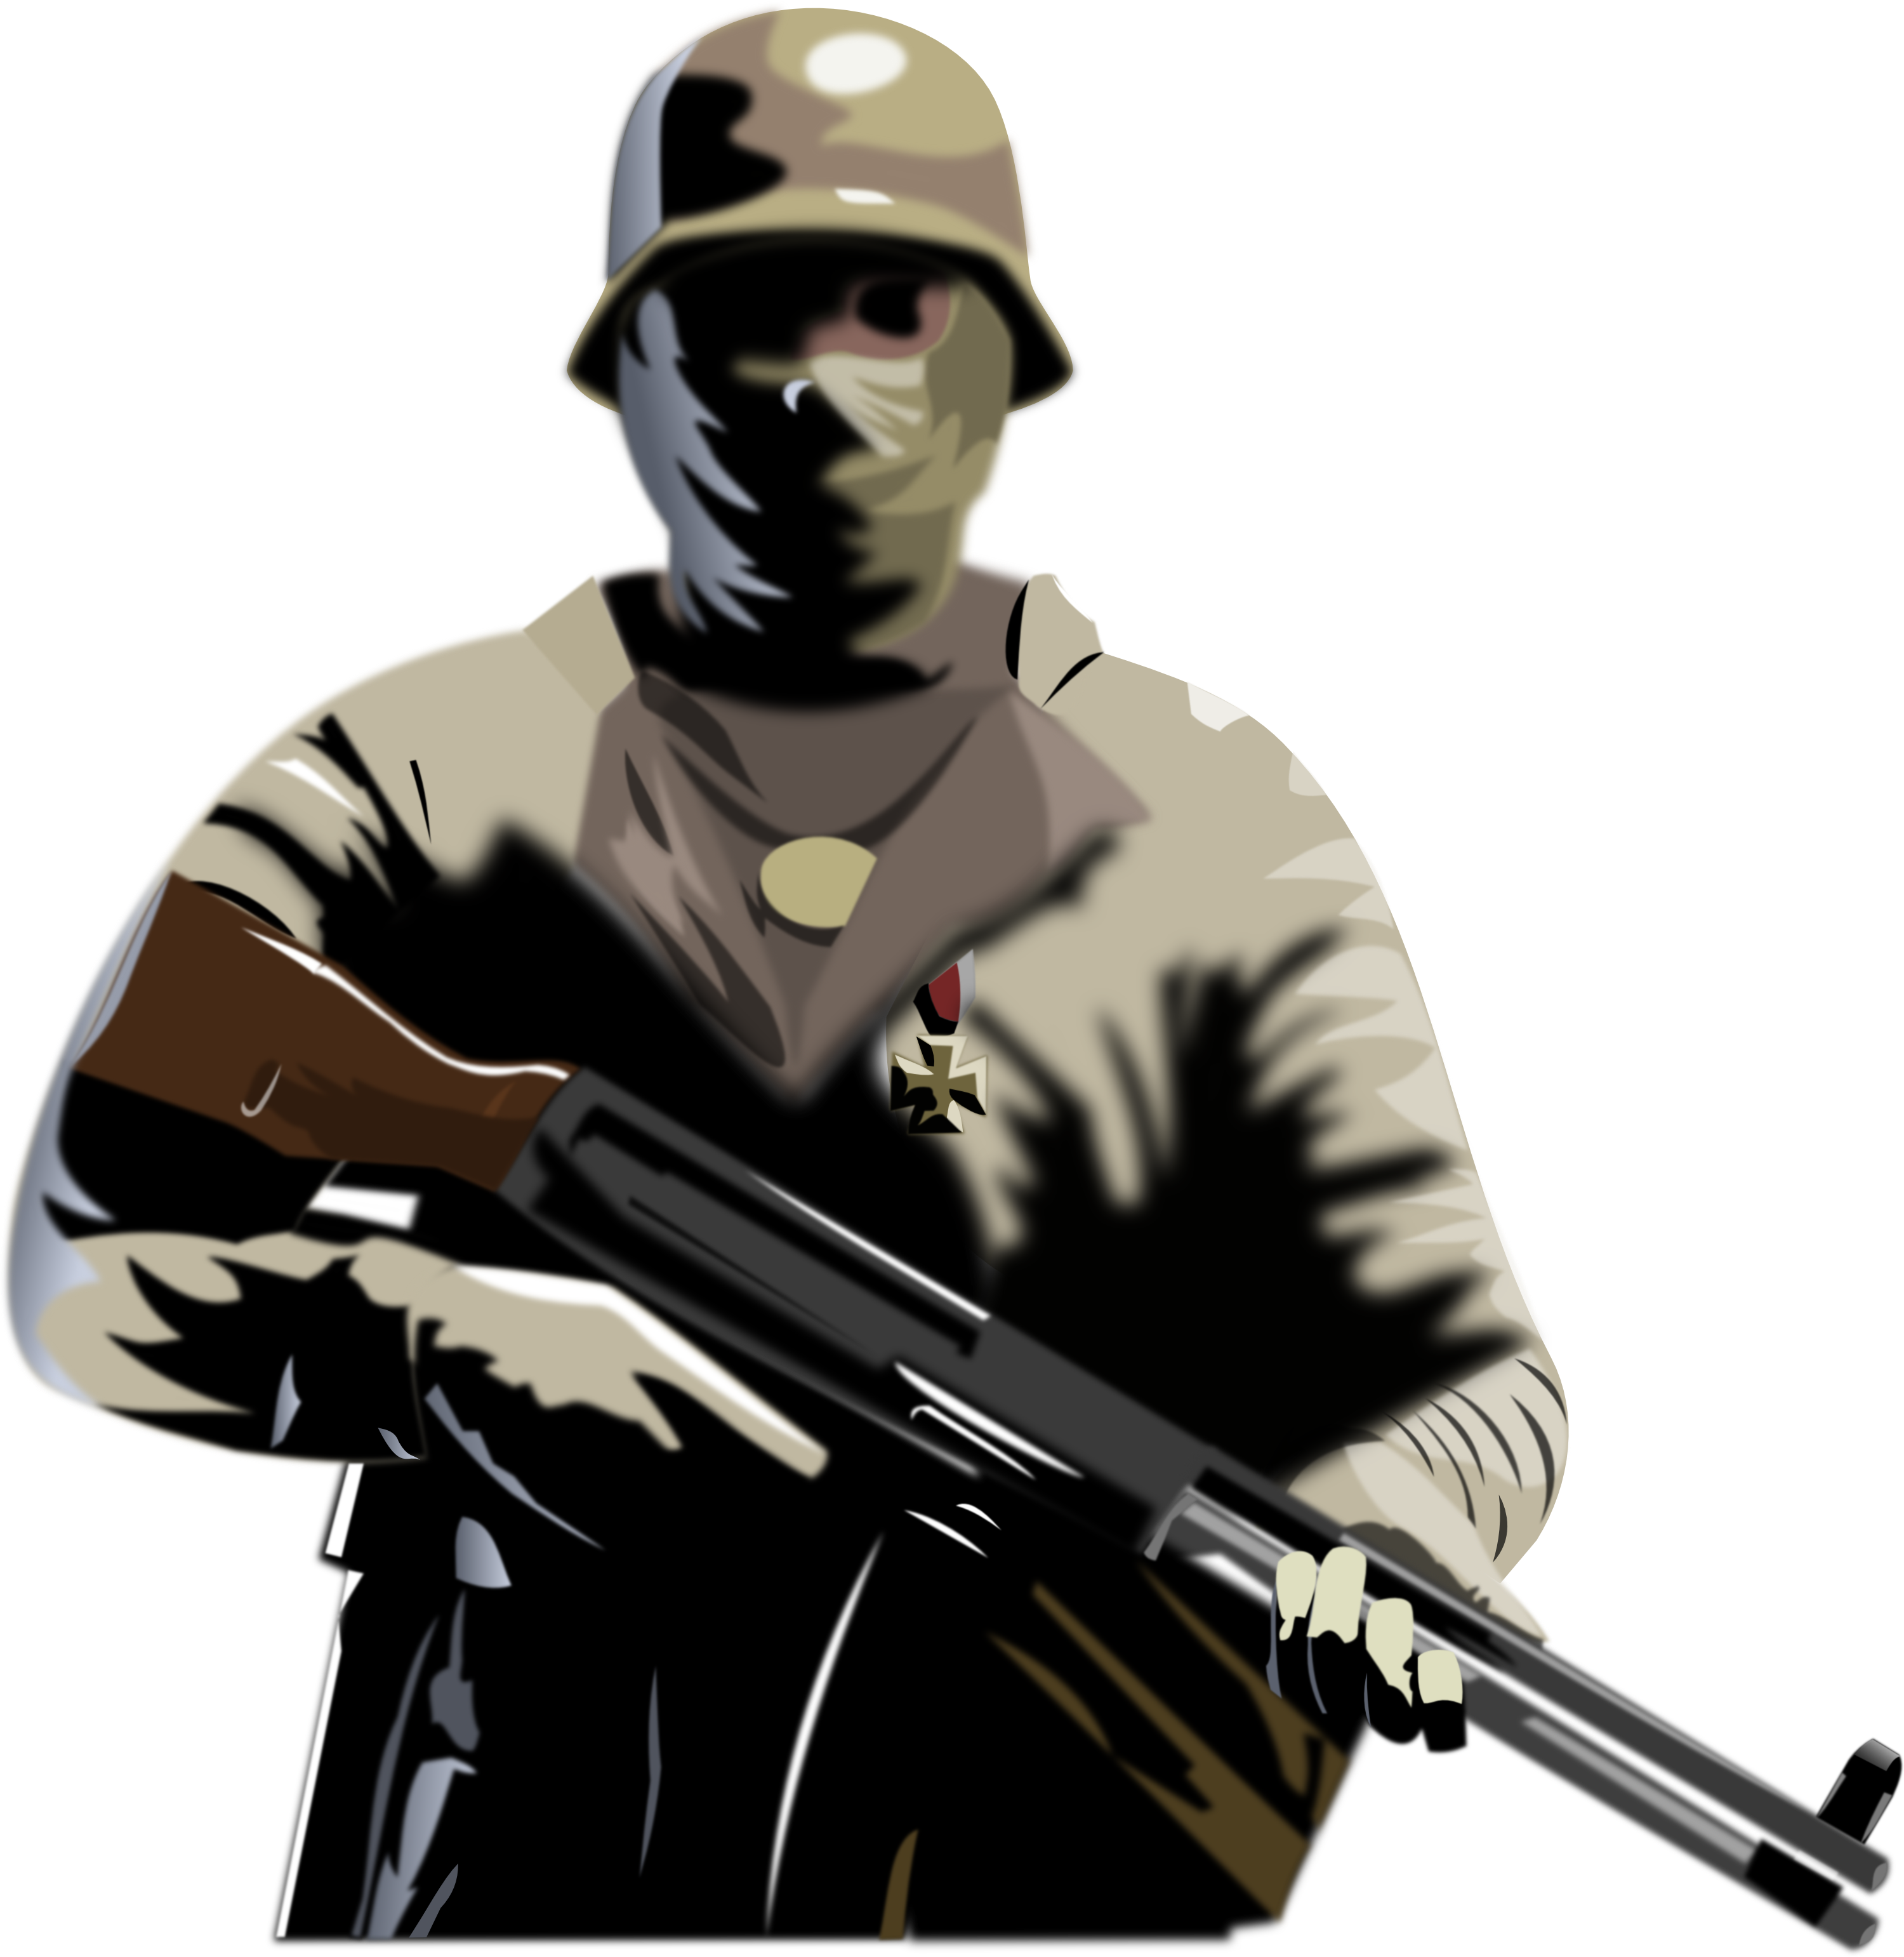 Ro Soldier Finale By Pasuri98 On Deviantart